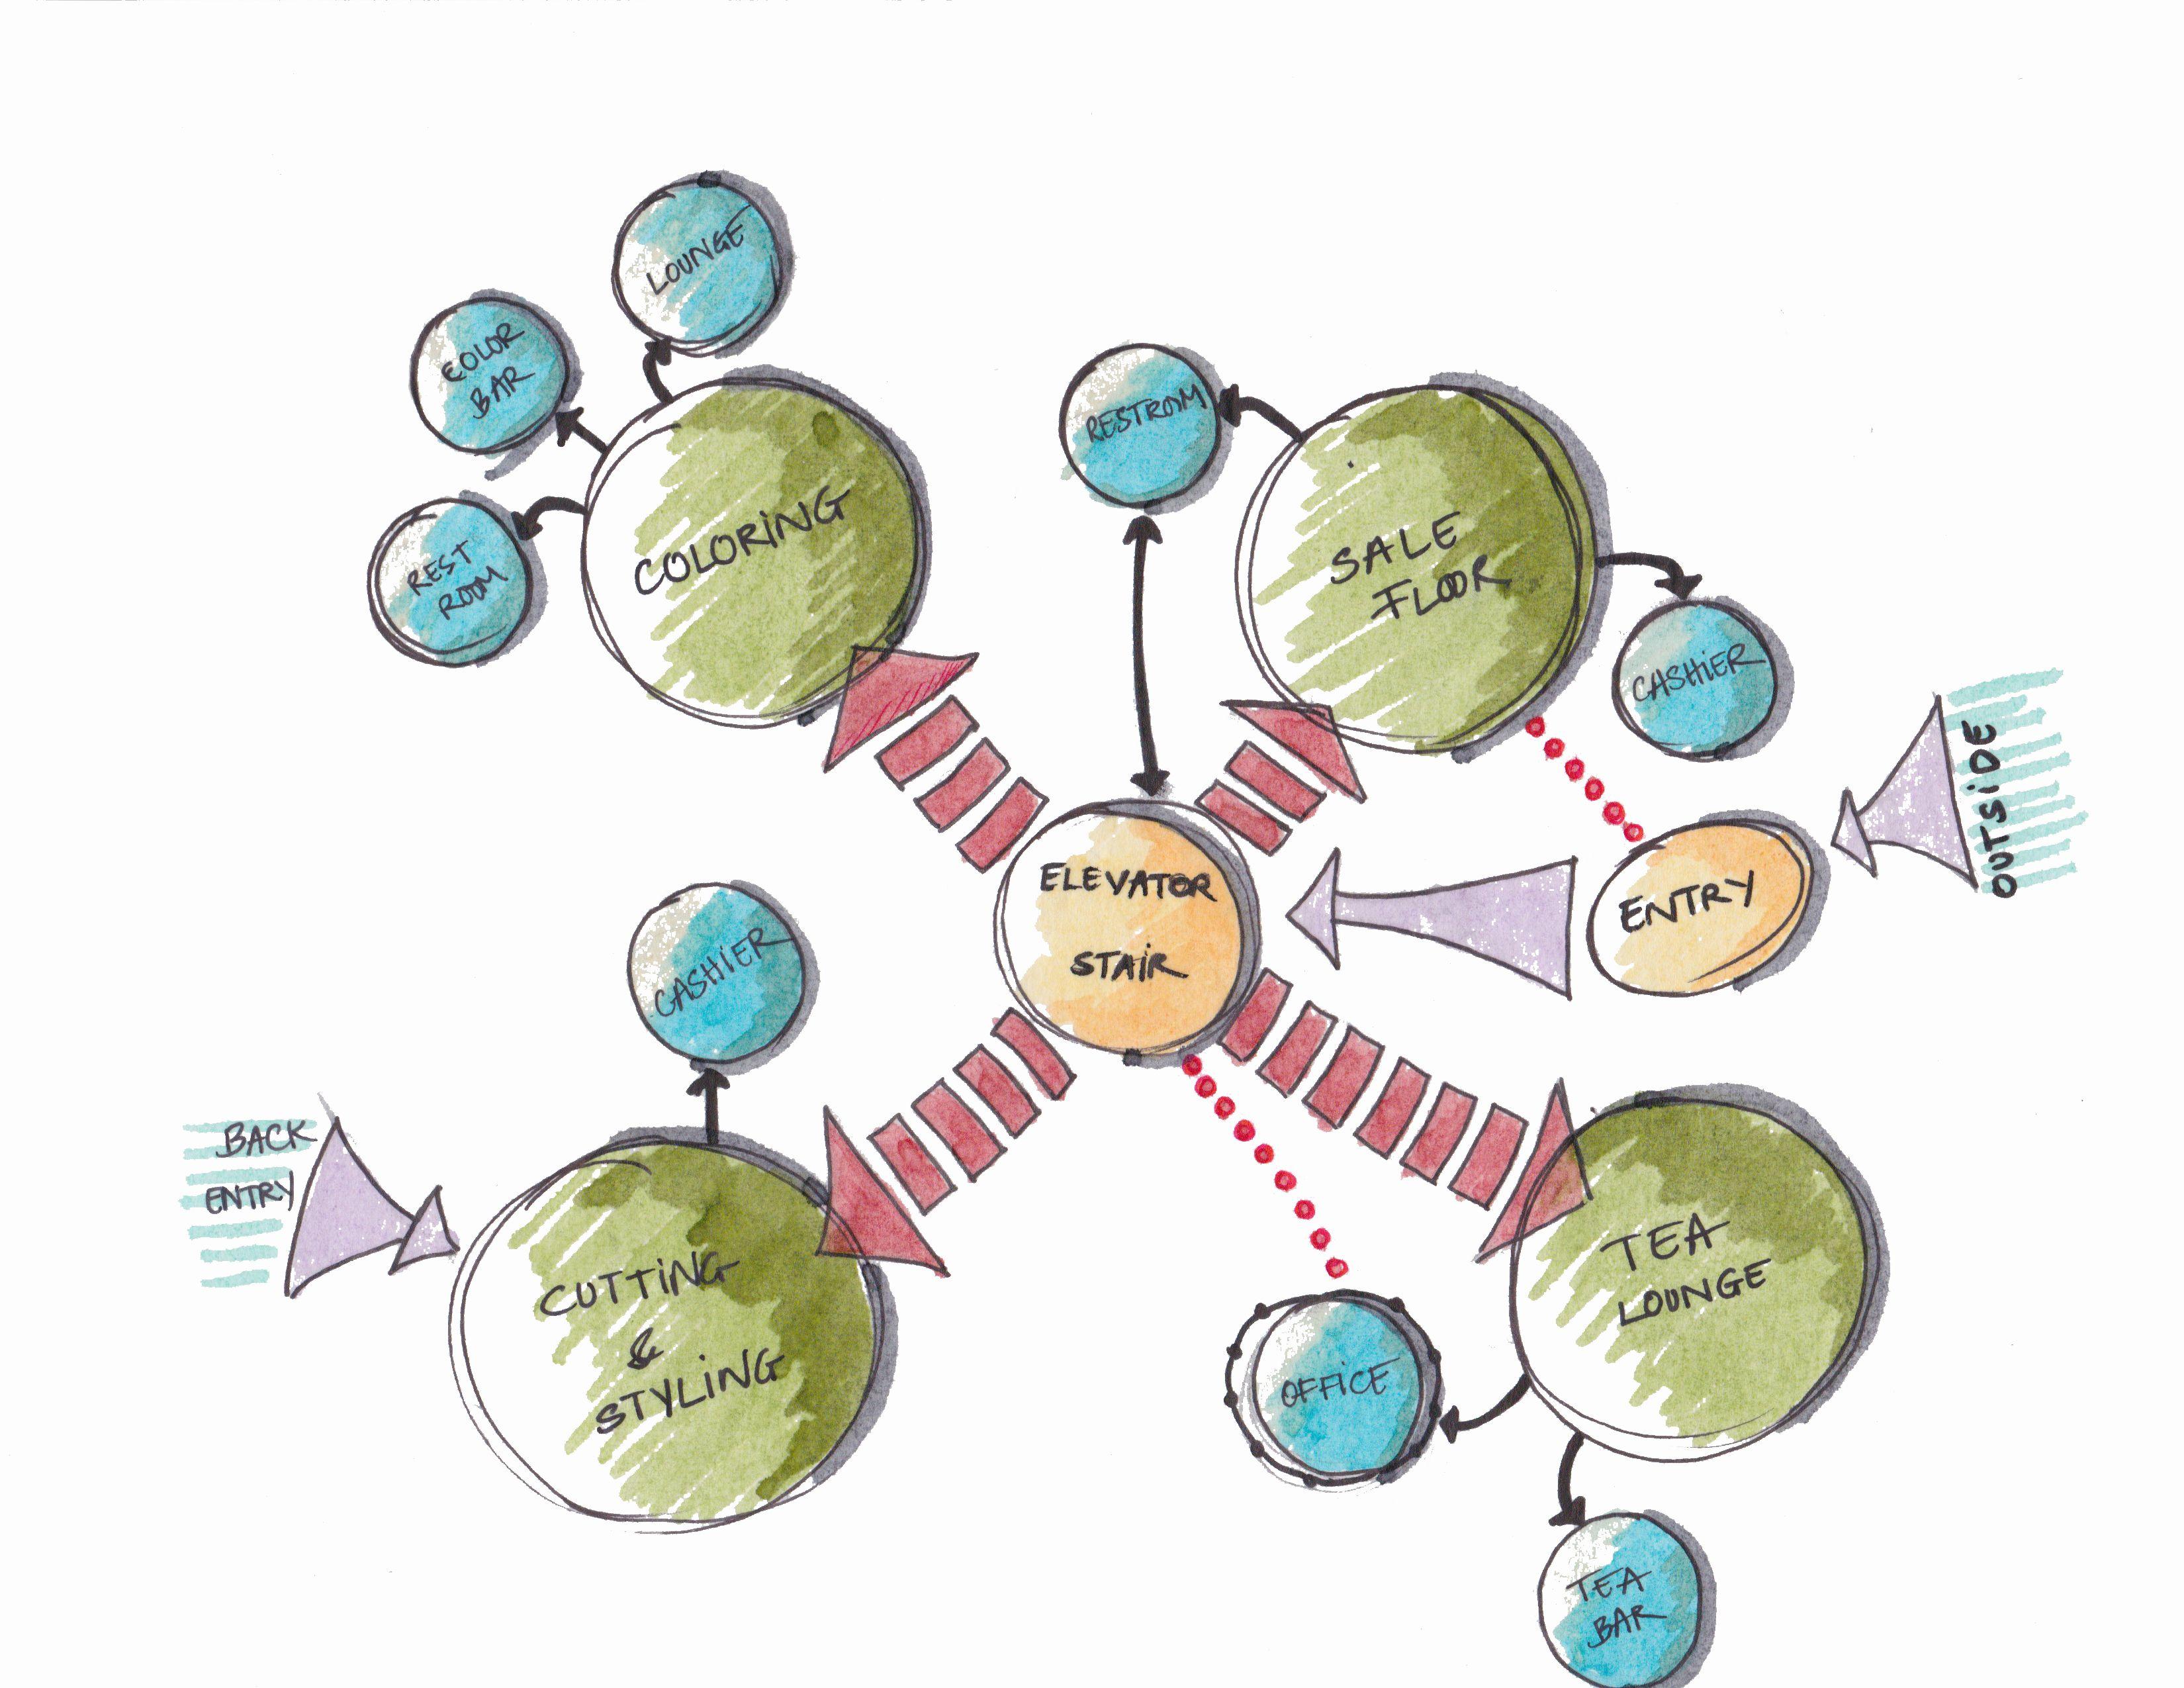 Retail Bubble Diagram | Layout | Pinterest | Diagram, Retail and ...